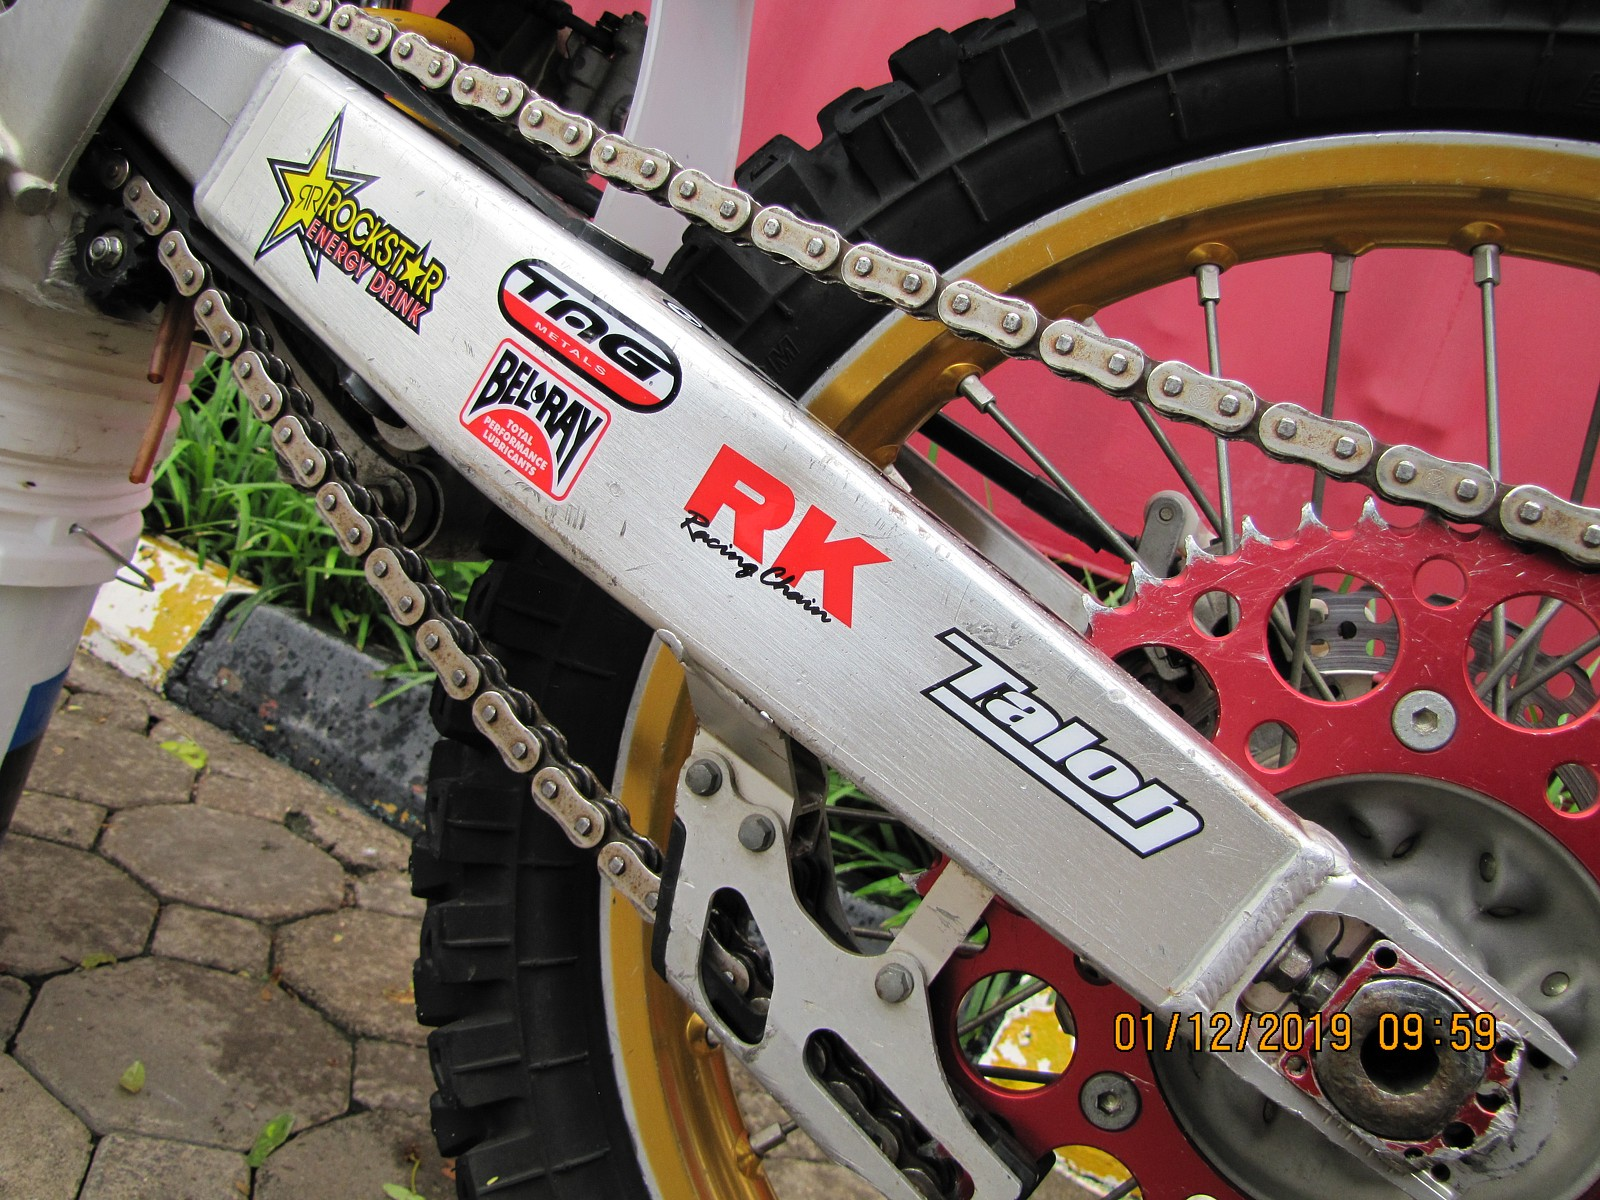 IMG 0009 - banny wailer - Motocross Pictures - Vital MX